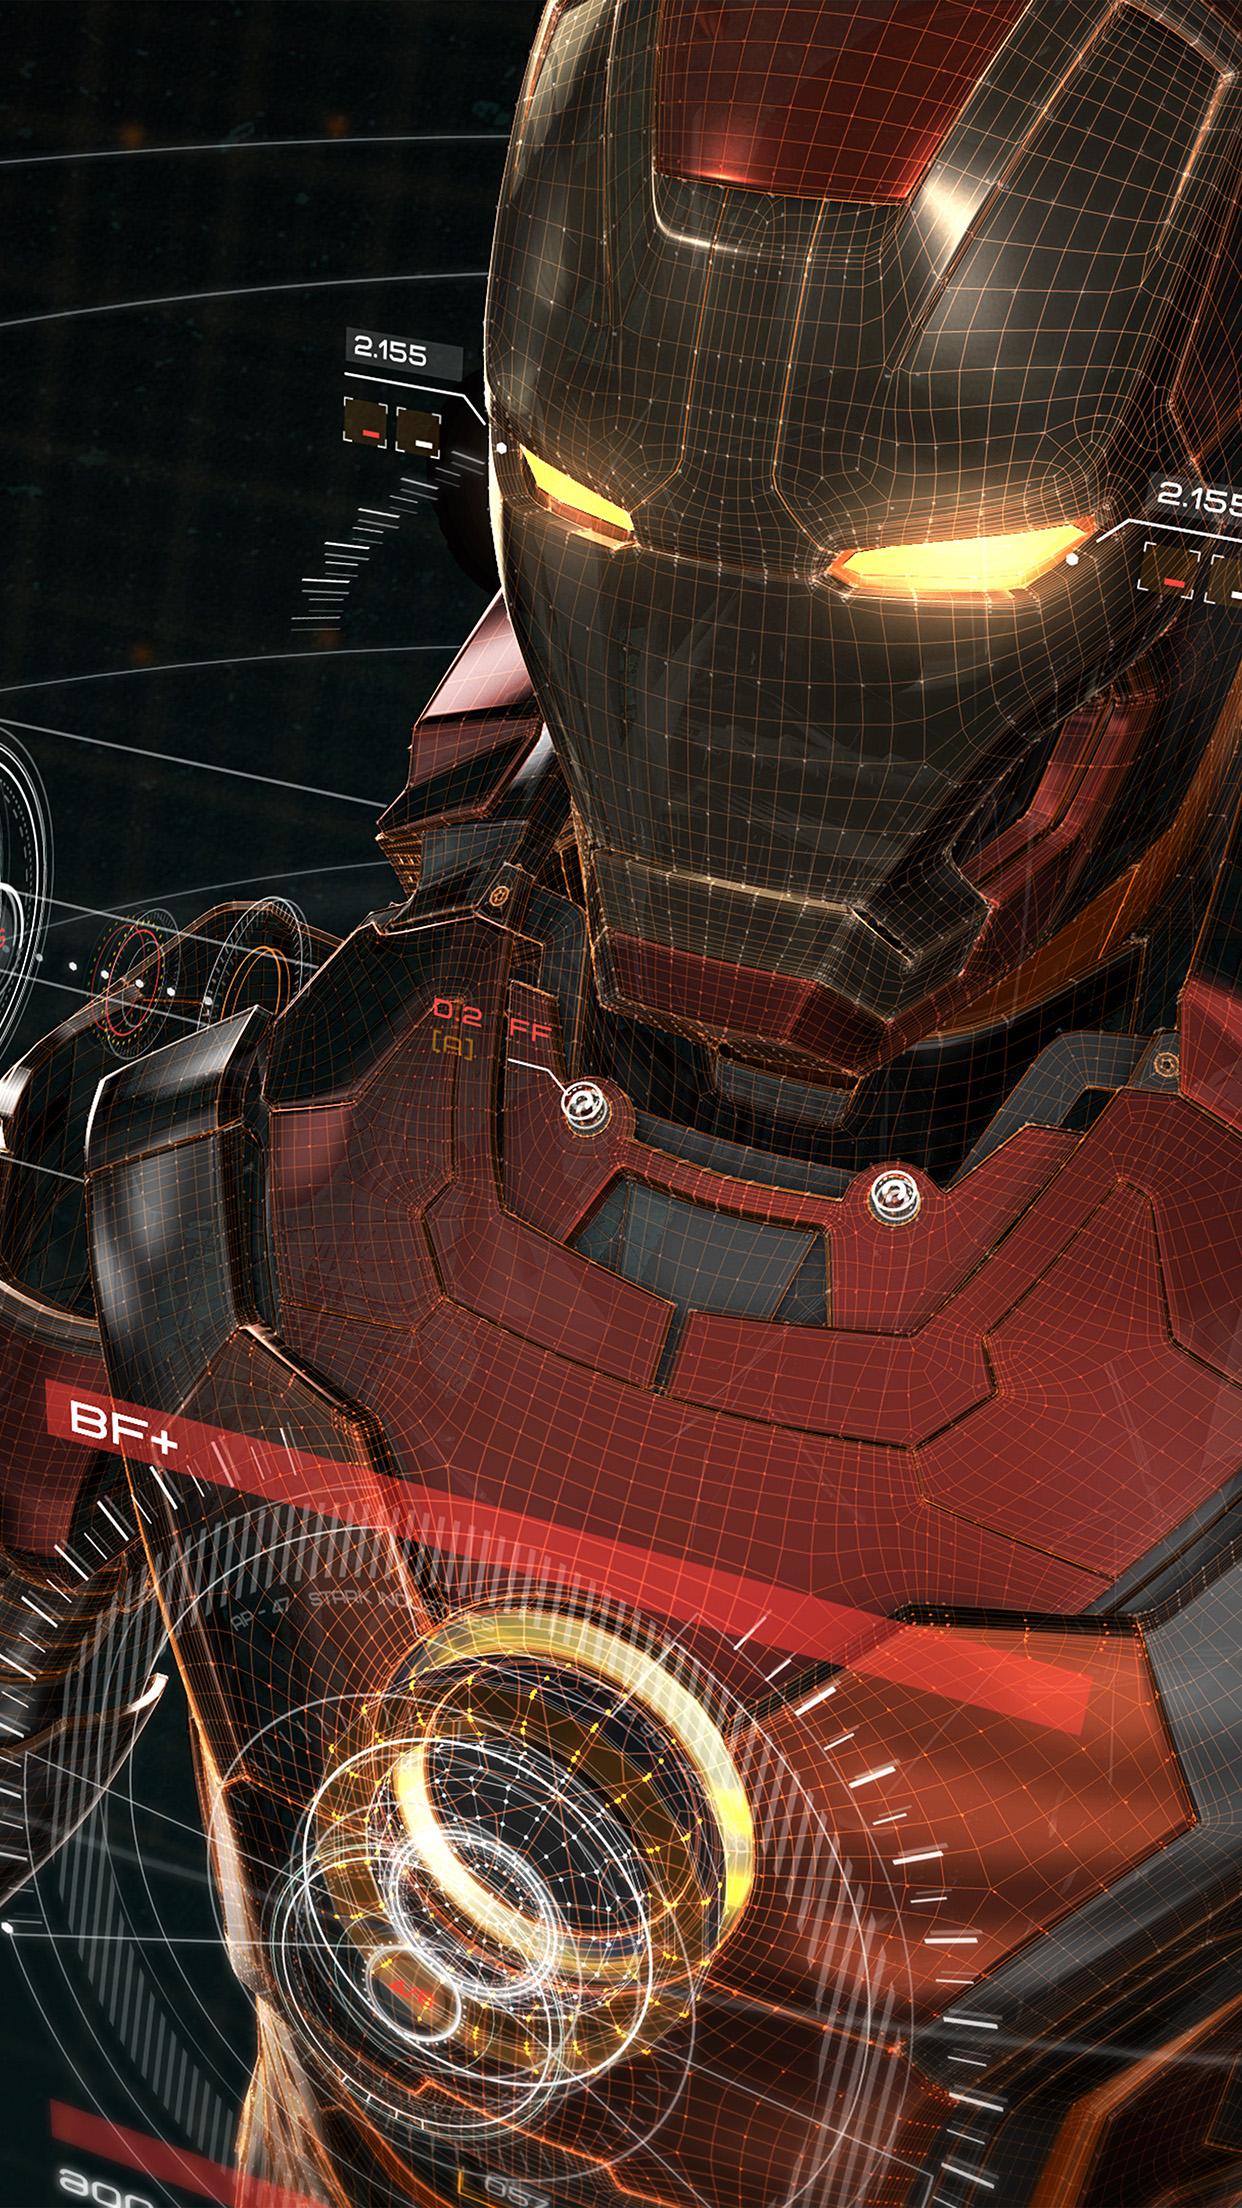 aq05-ironman-3d-red-game-avengers-art-illustration-hero ...